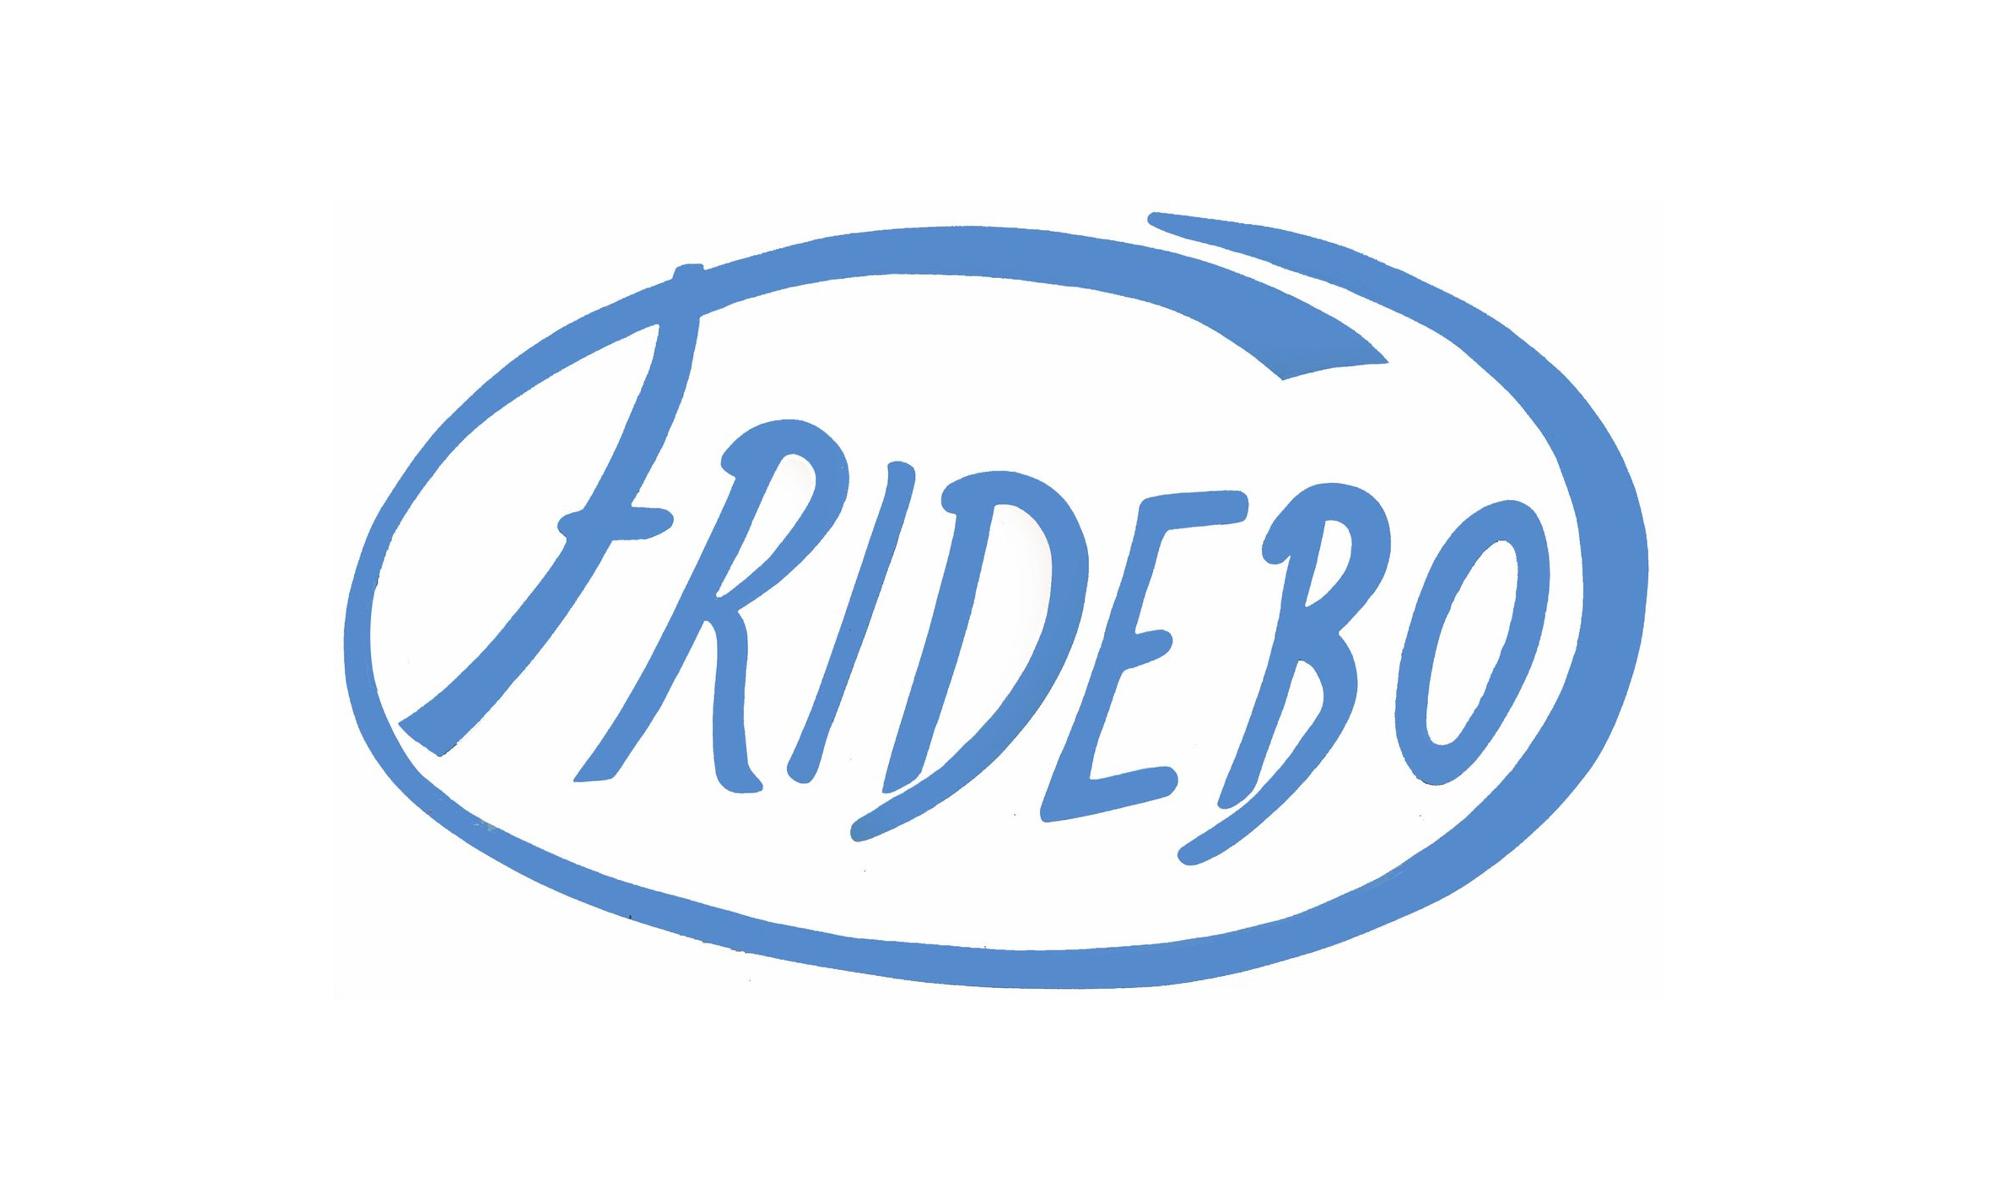 Fridebo